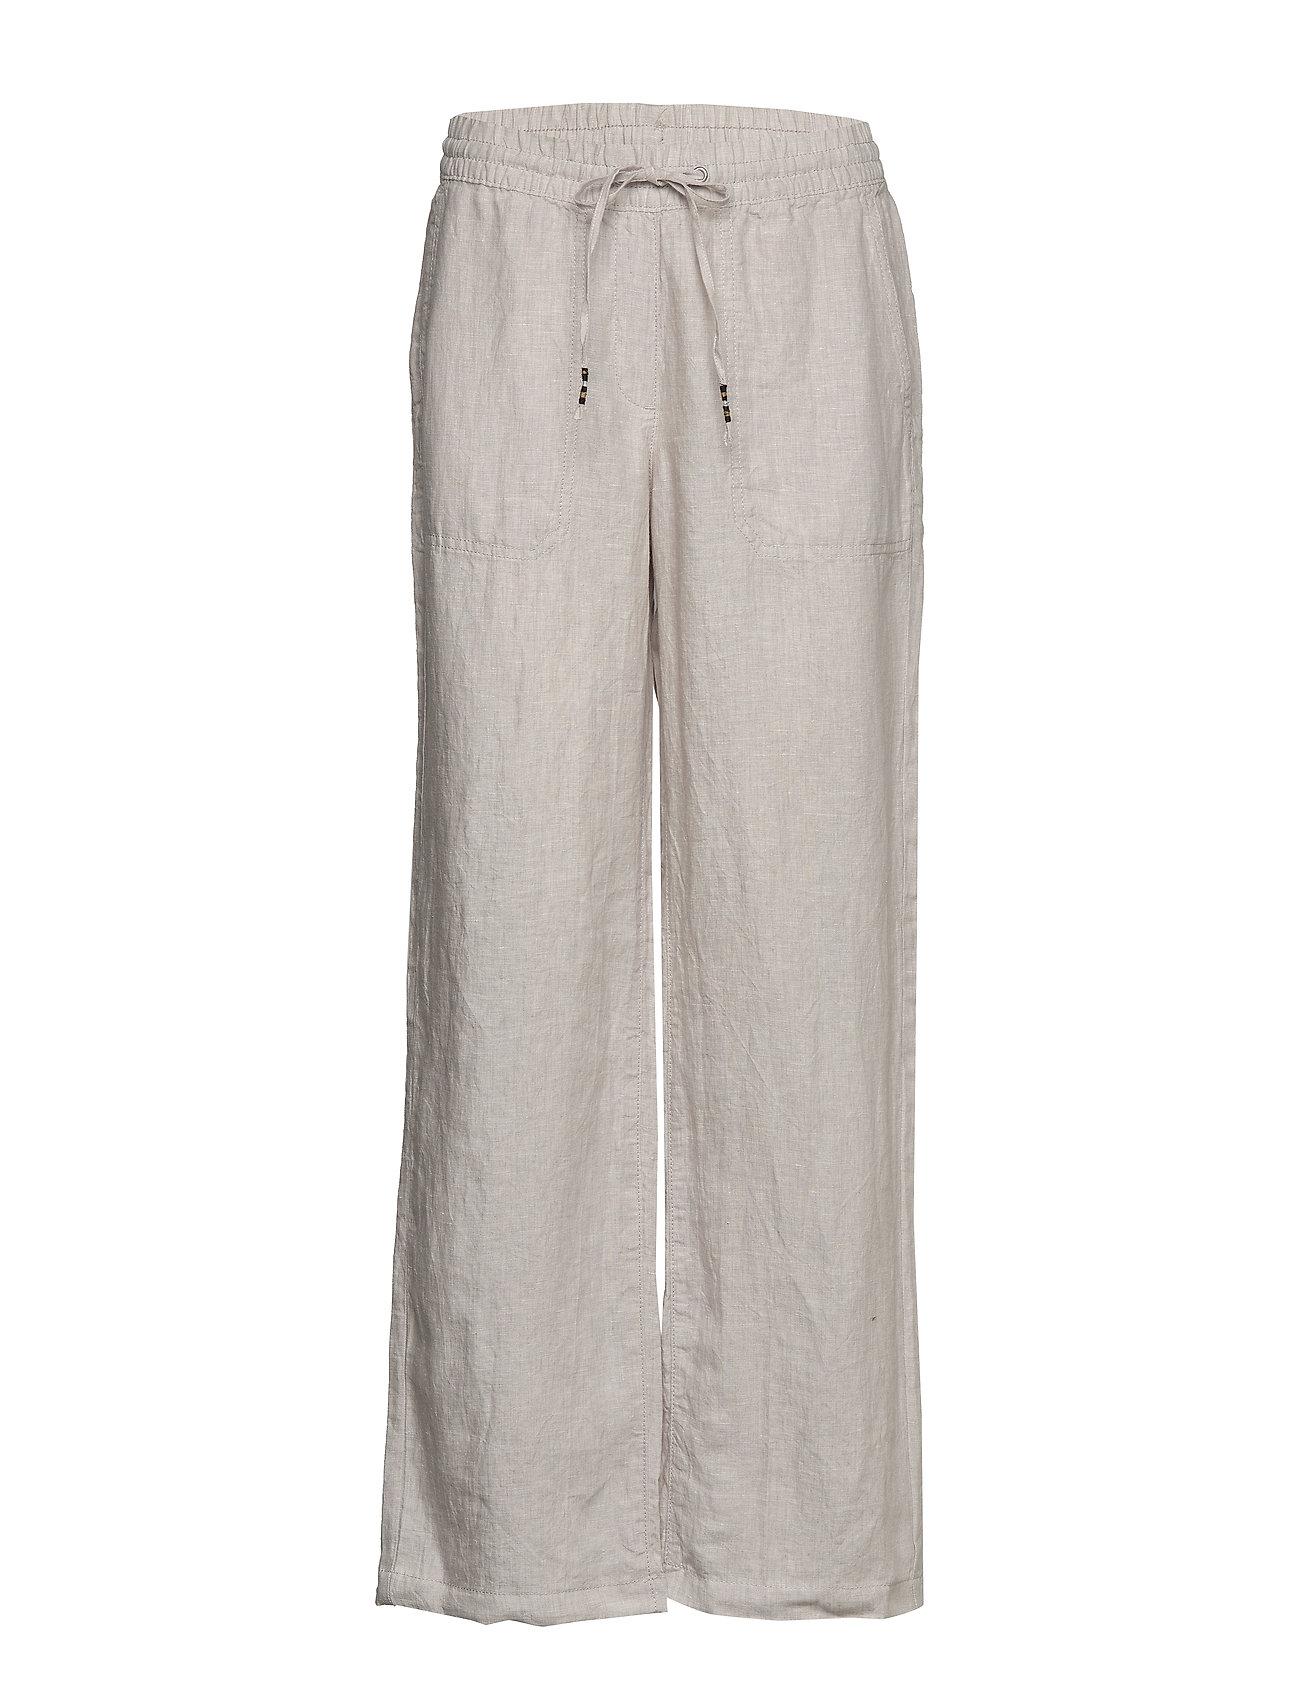 Esprit Casual Pants woven - LIGHT BEIGE